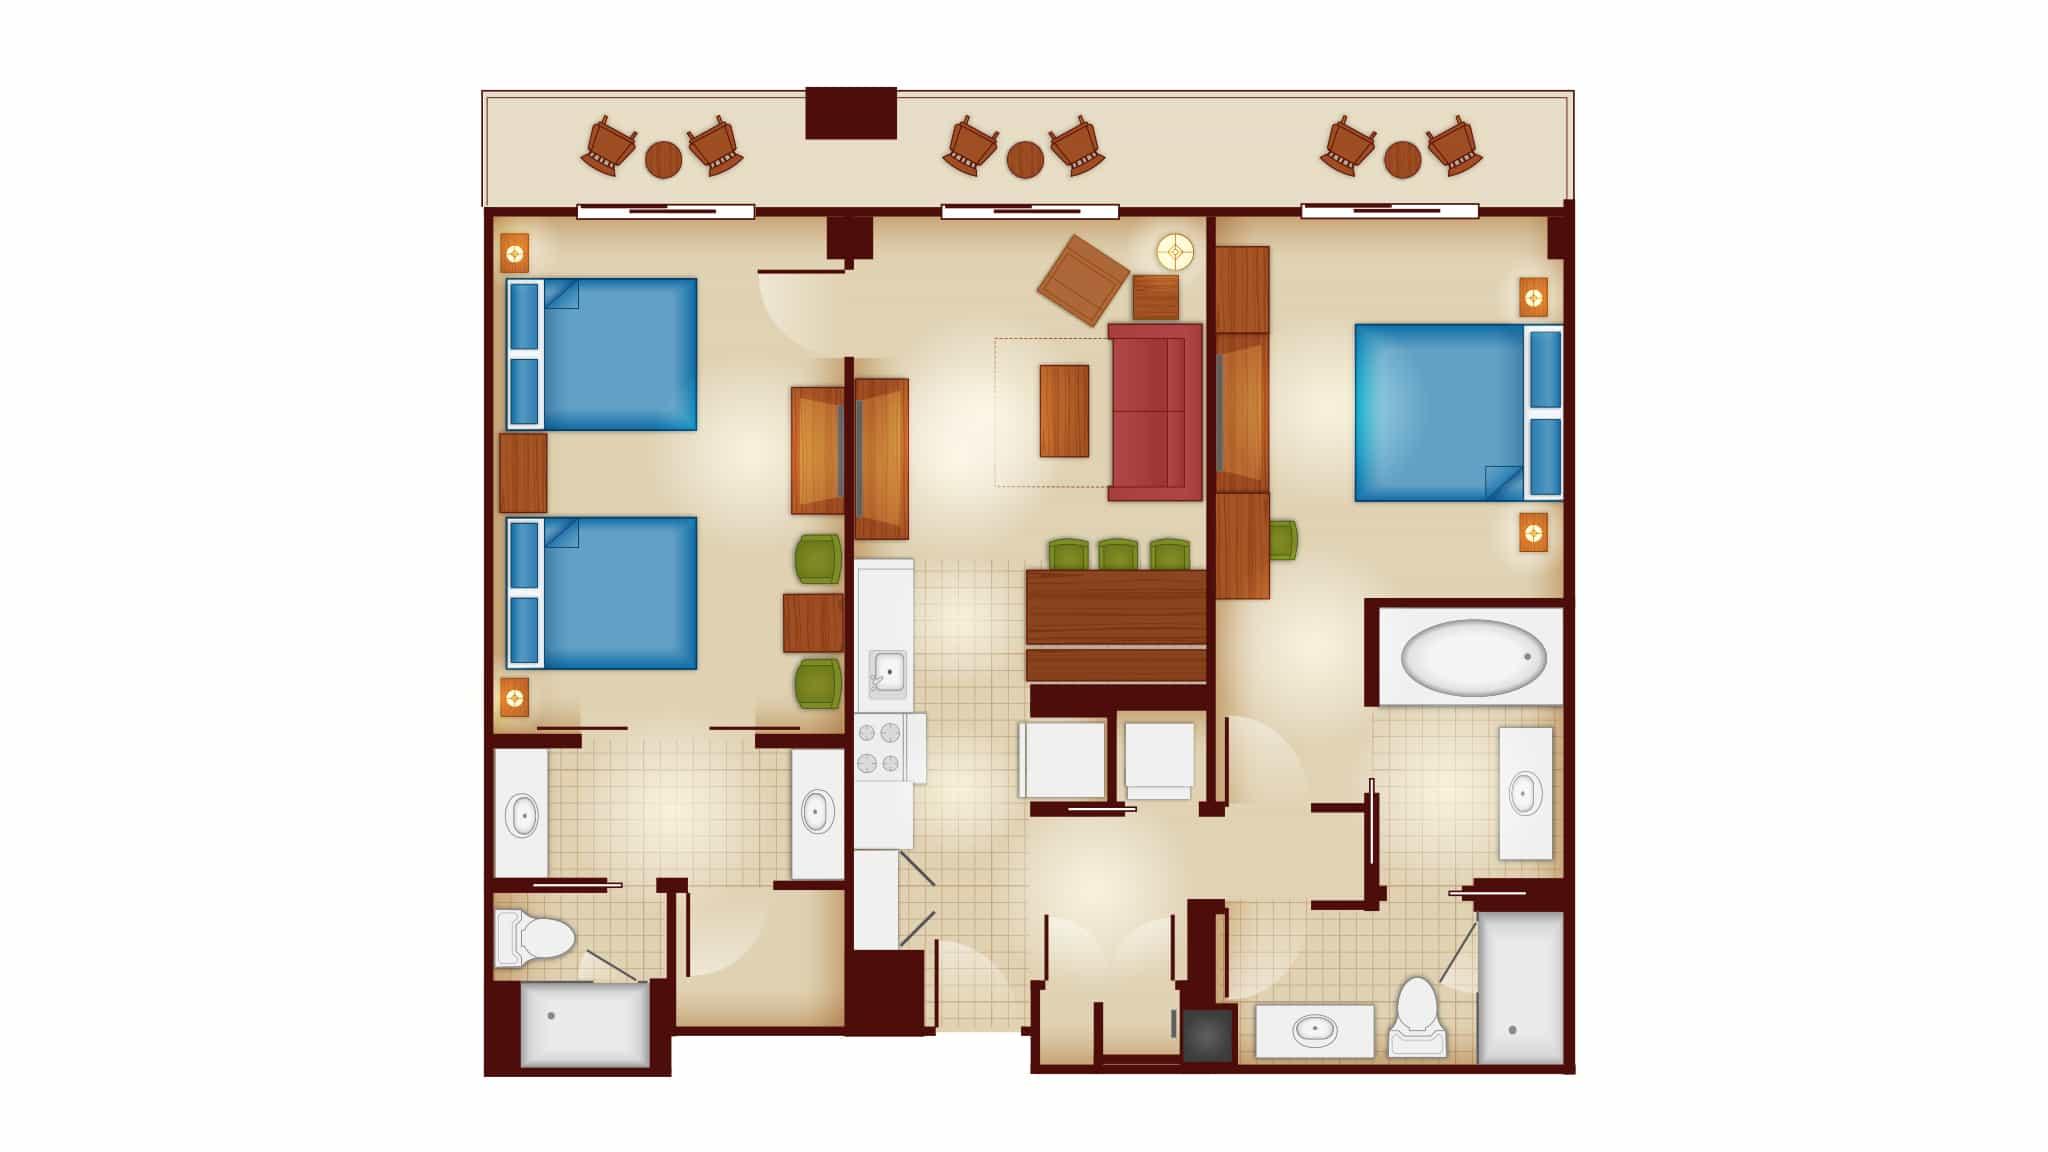 Two Bedroom Villa, Copper Creek Villas and Cabins at Wilderness Lodge